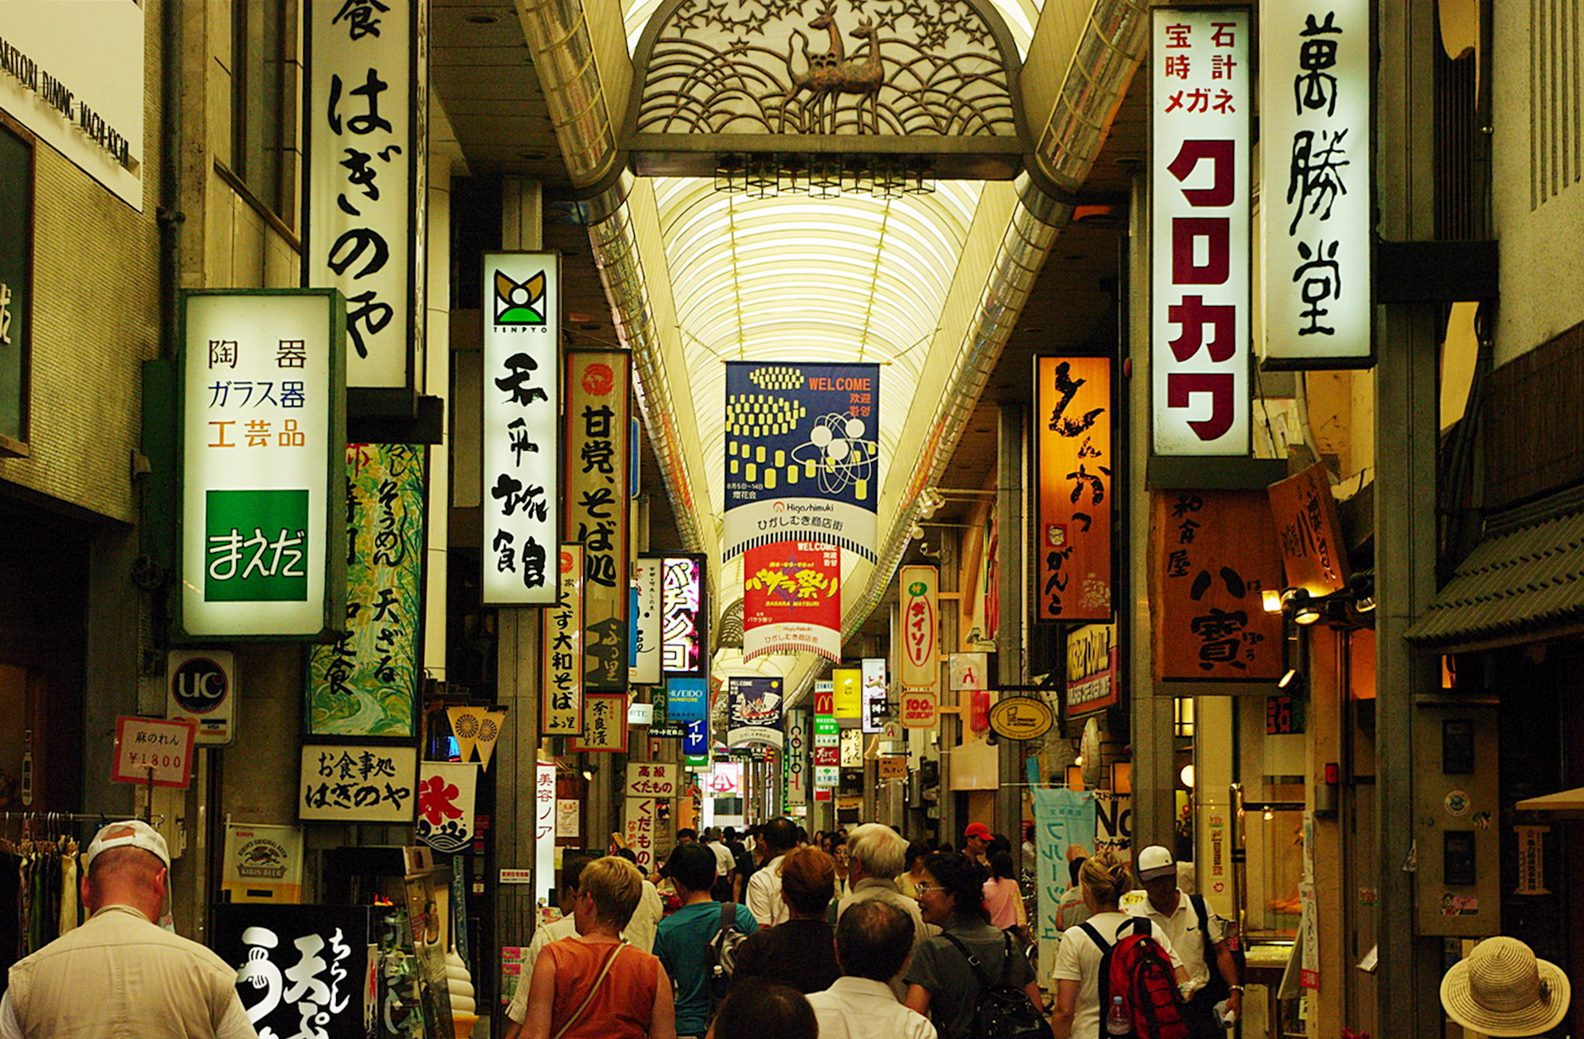 奈良-景點-推薦-東向商店街-Higashimuki Shopping Street-市區-自由行-必玩-必遊-必去-旅遊-觀光-日本-Nara-Tourist-Attraction